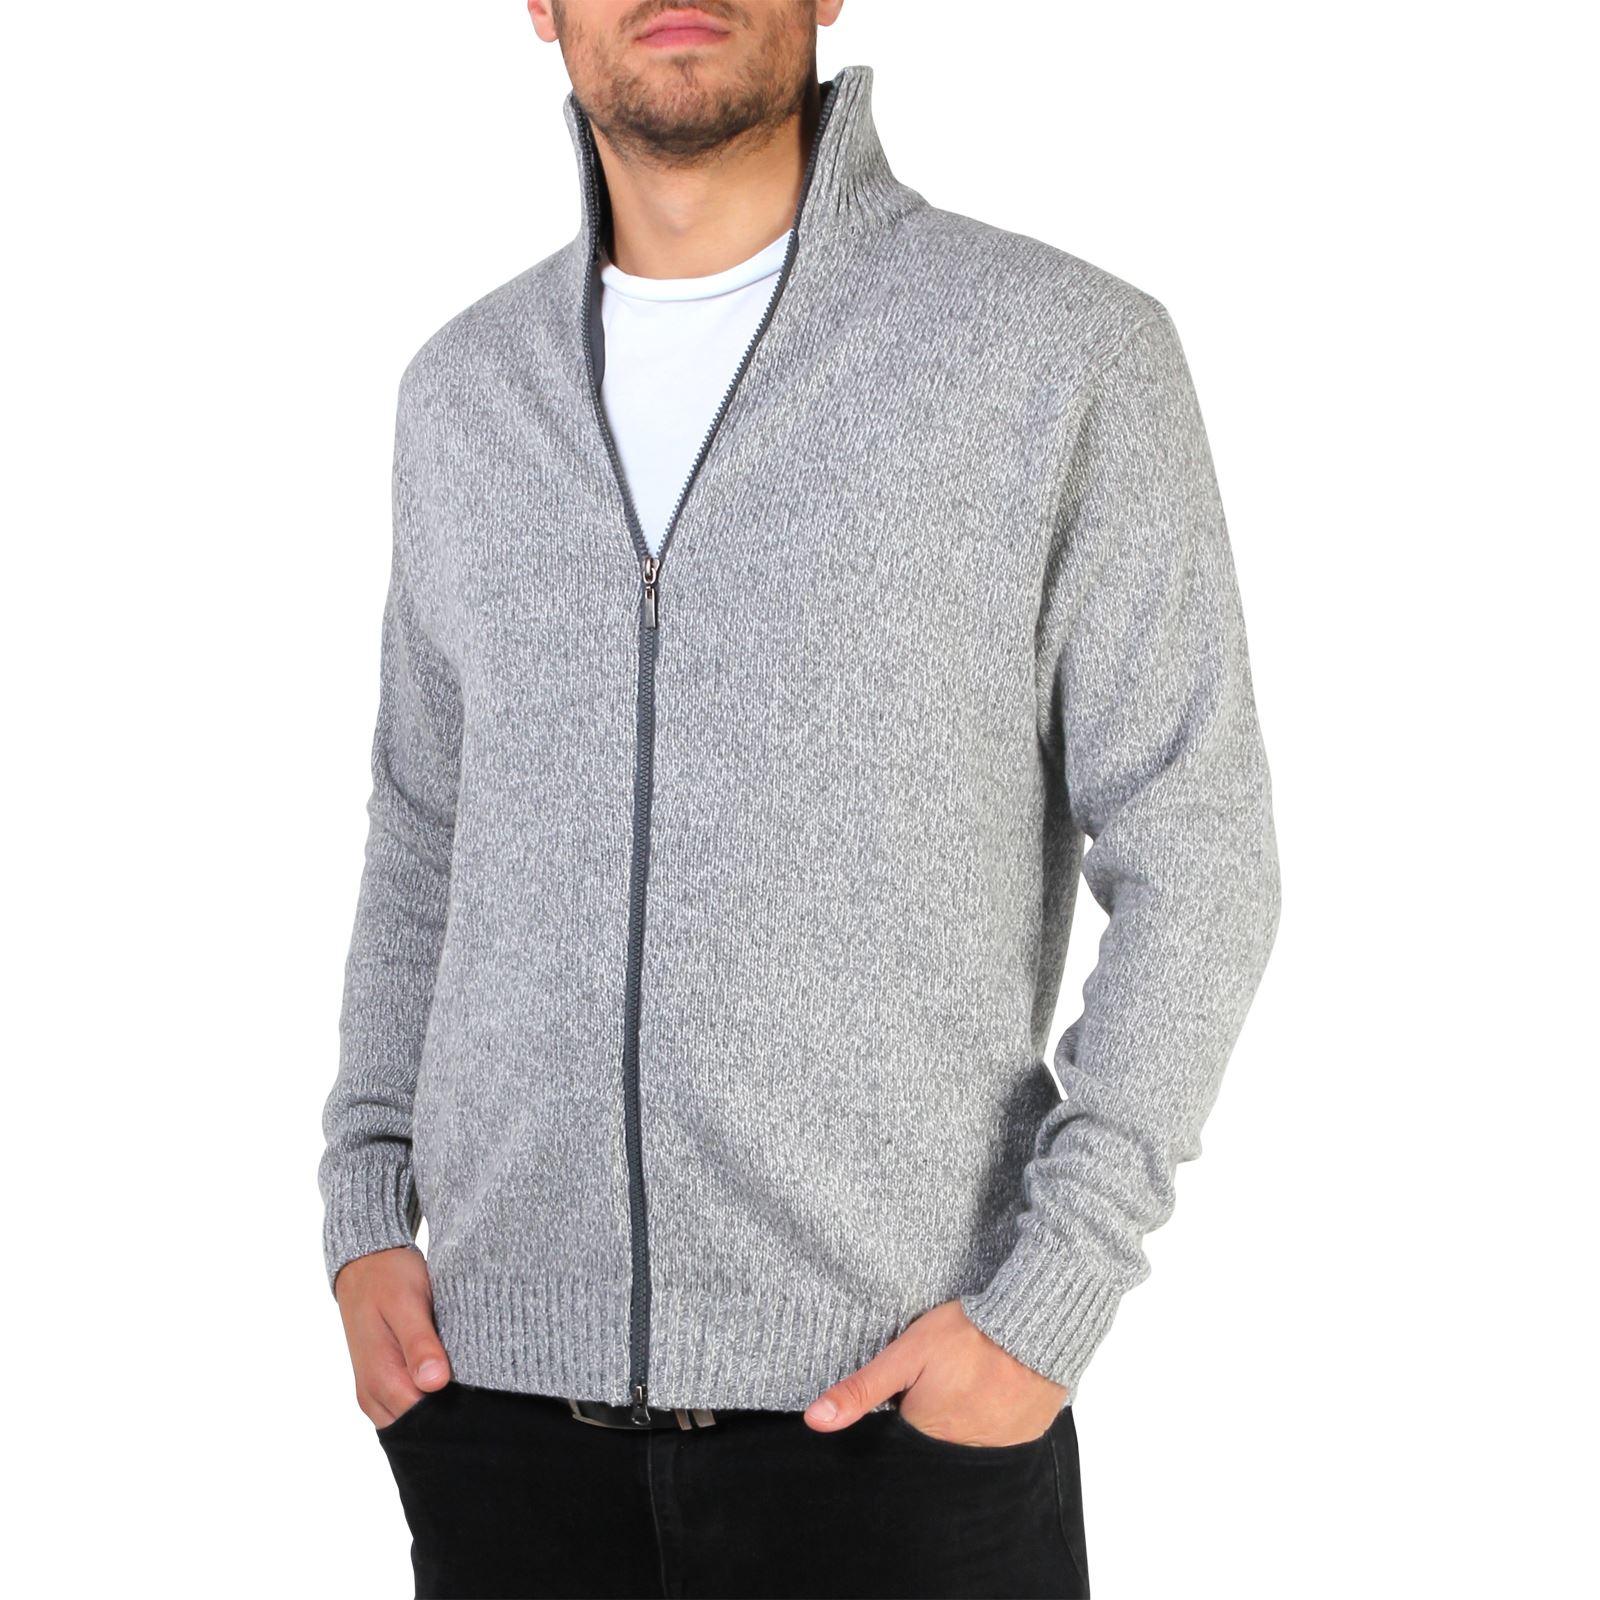 Mens-Wool-Jumper-Winter-Sweater-Zip-Up-Funnel-Neck-Soft-Knit-Cardigan-Top thumbnail 9